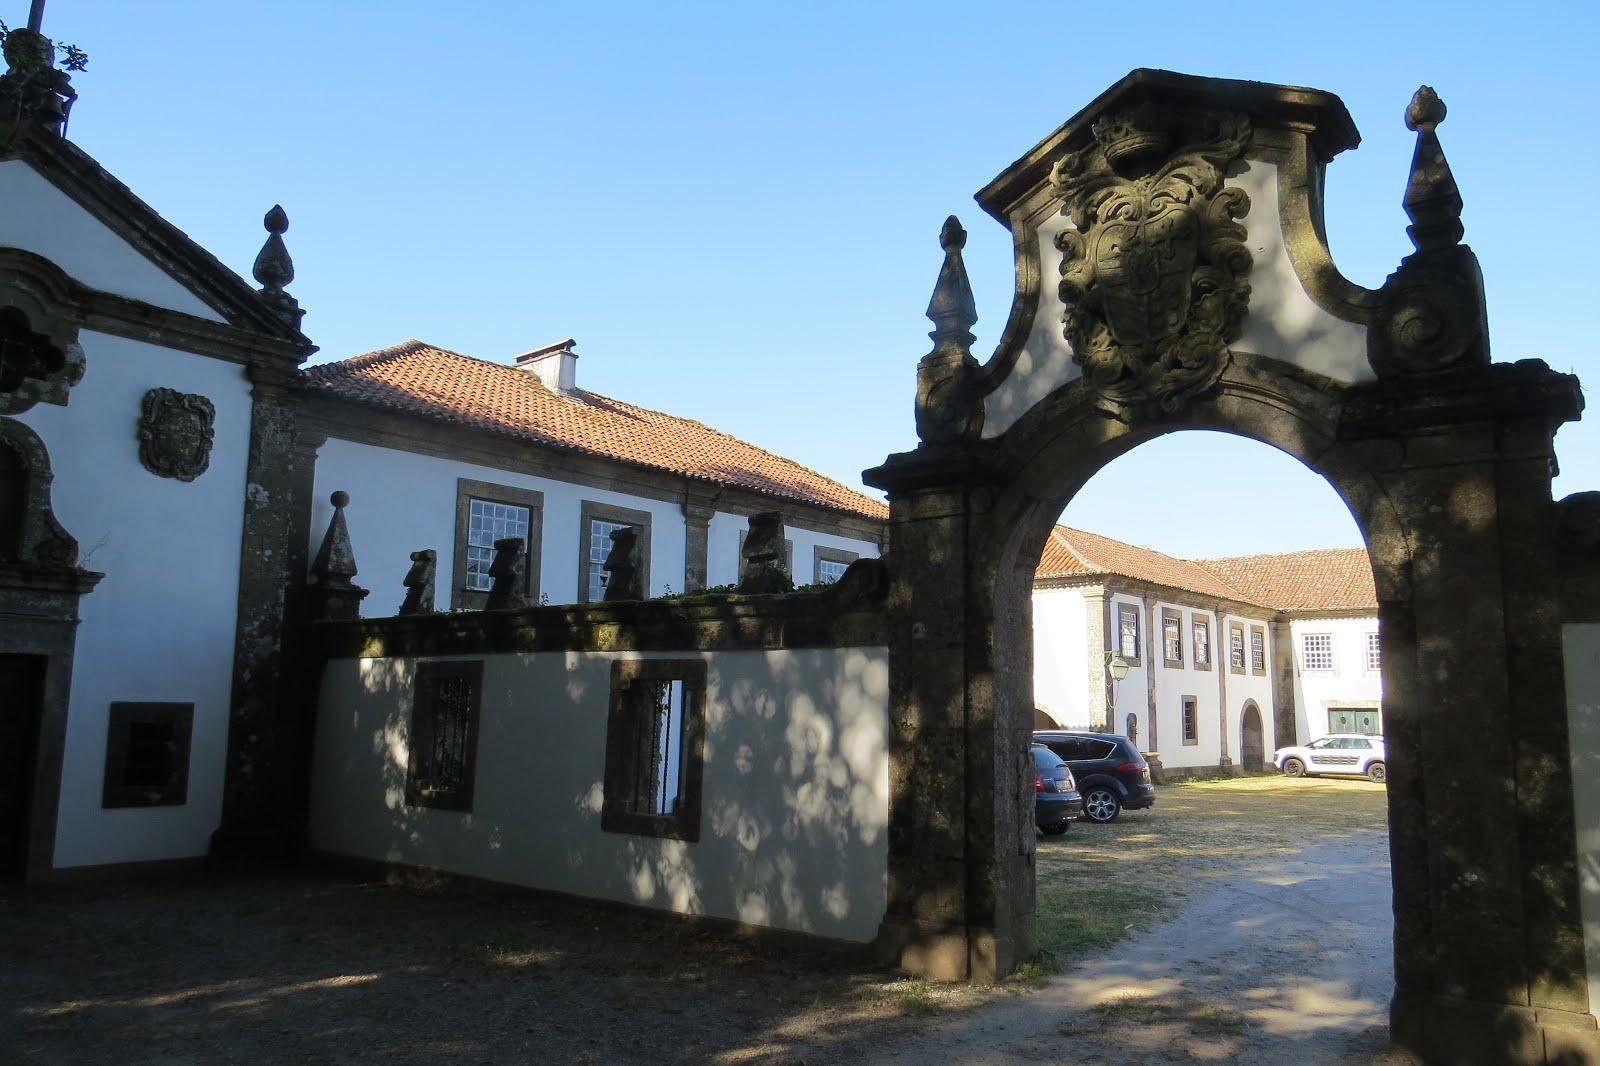 CASA DO PAÇO CONDES D'ALMADA - LANHESES